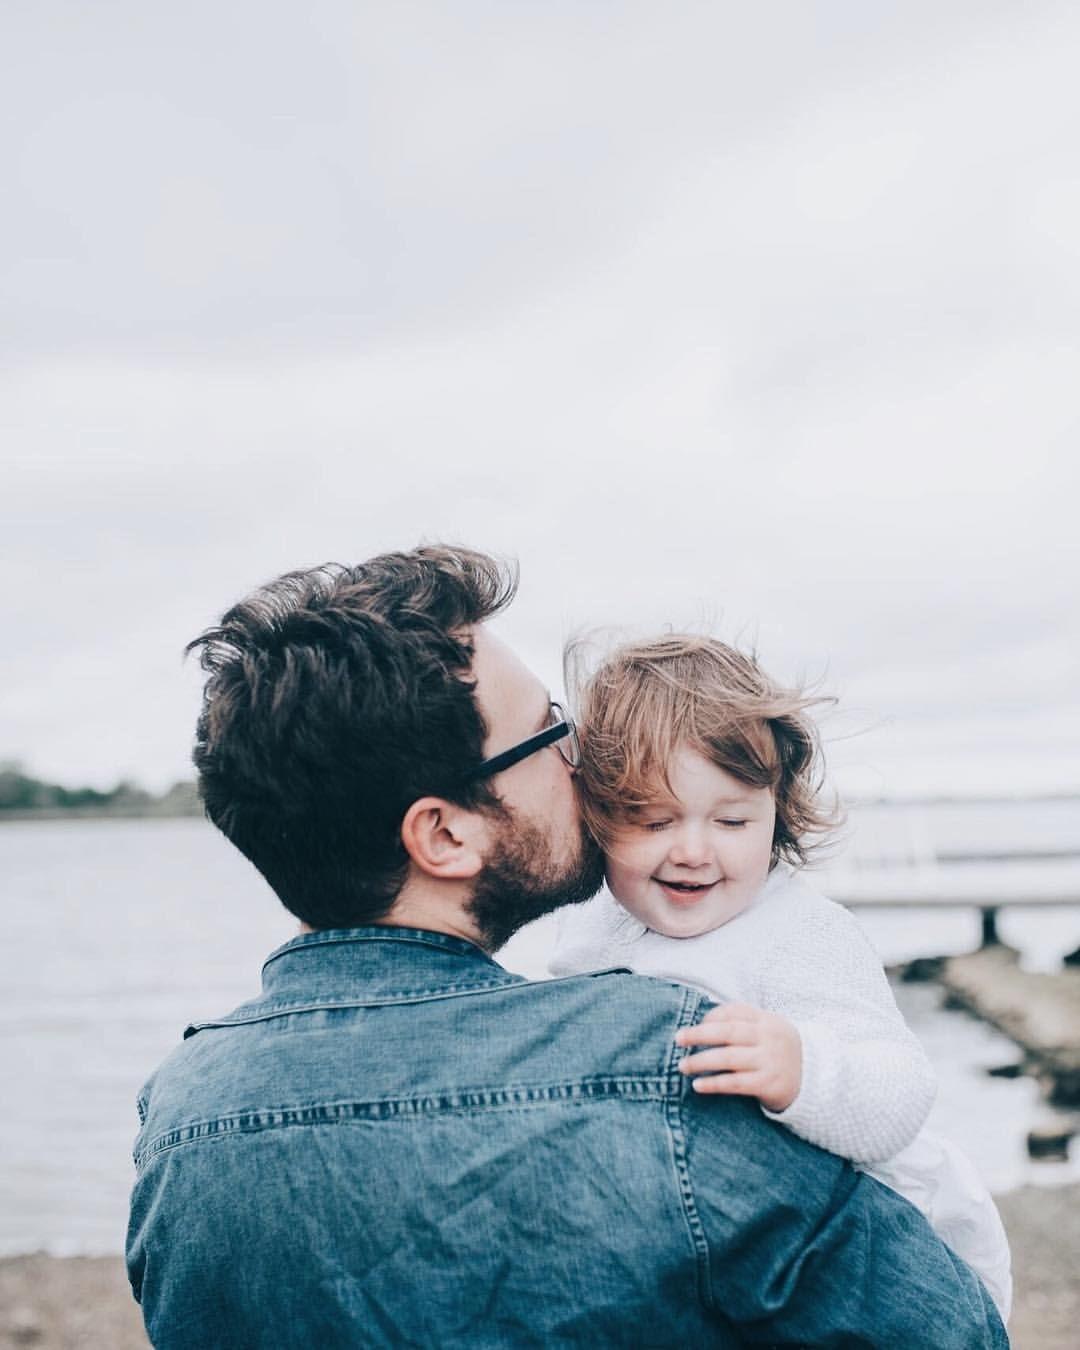 Daddy & Daughter photos. ❤️